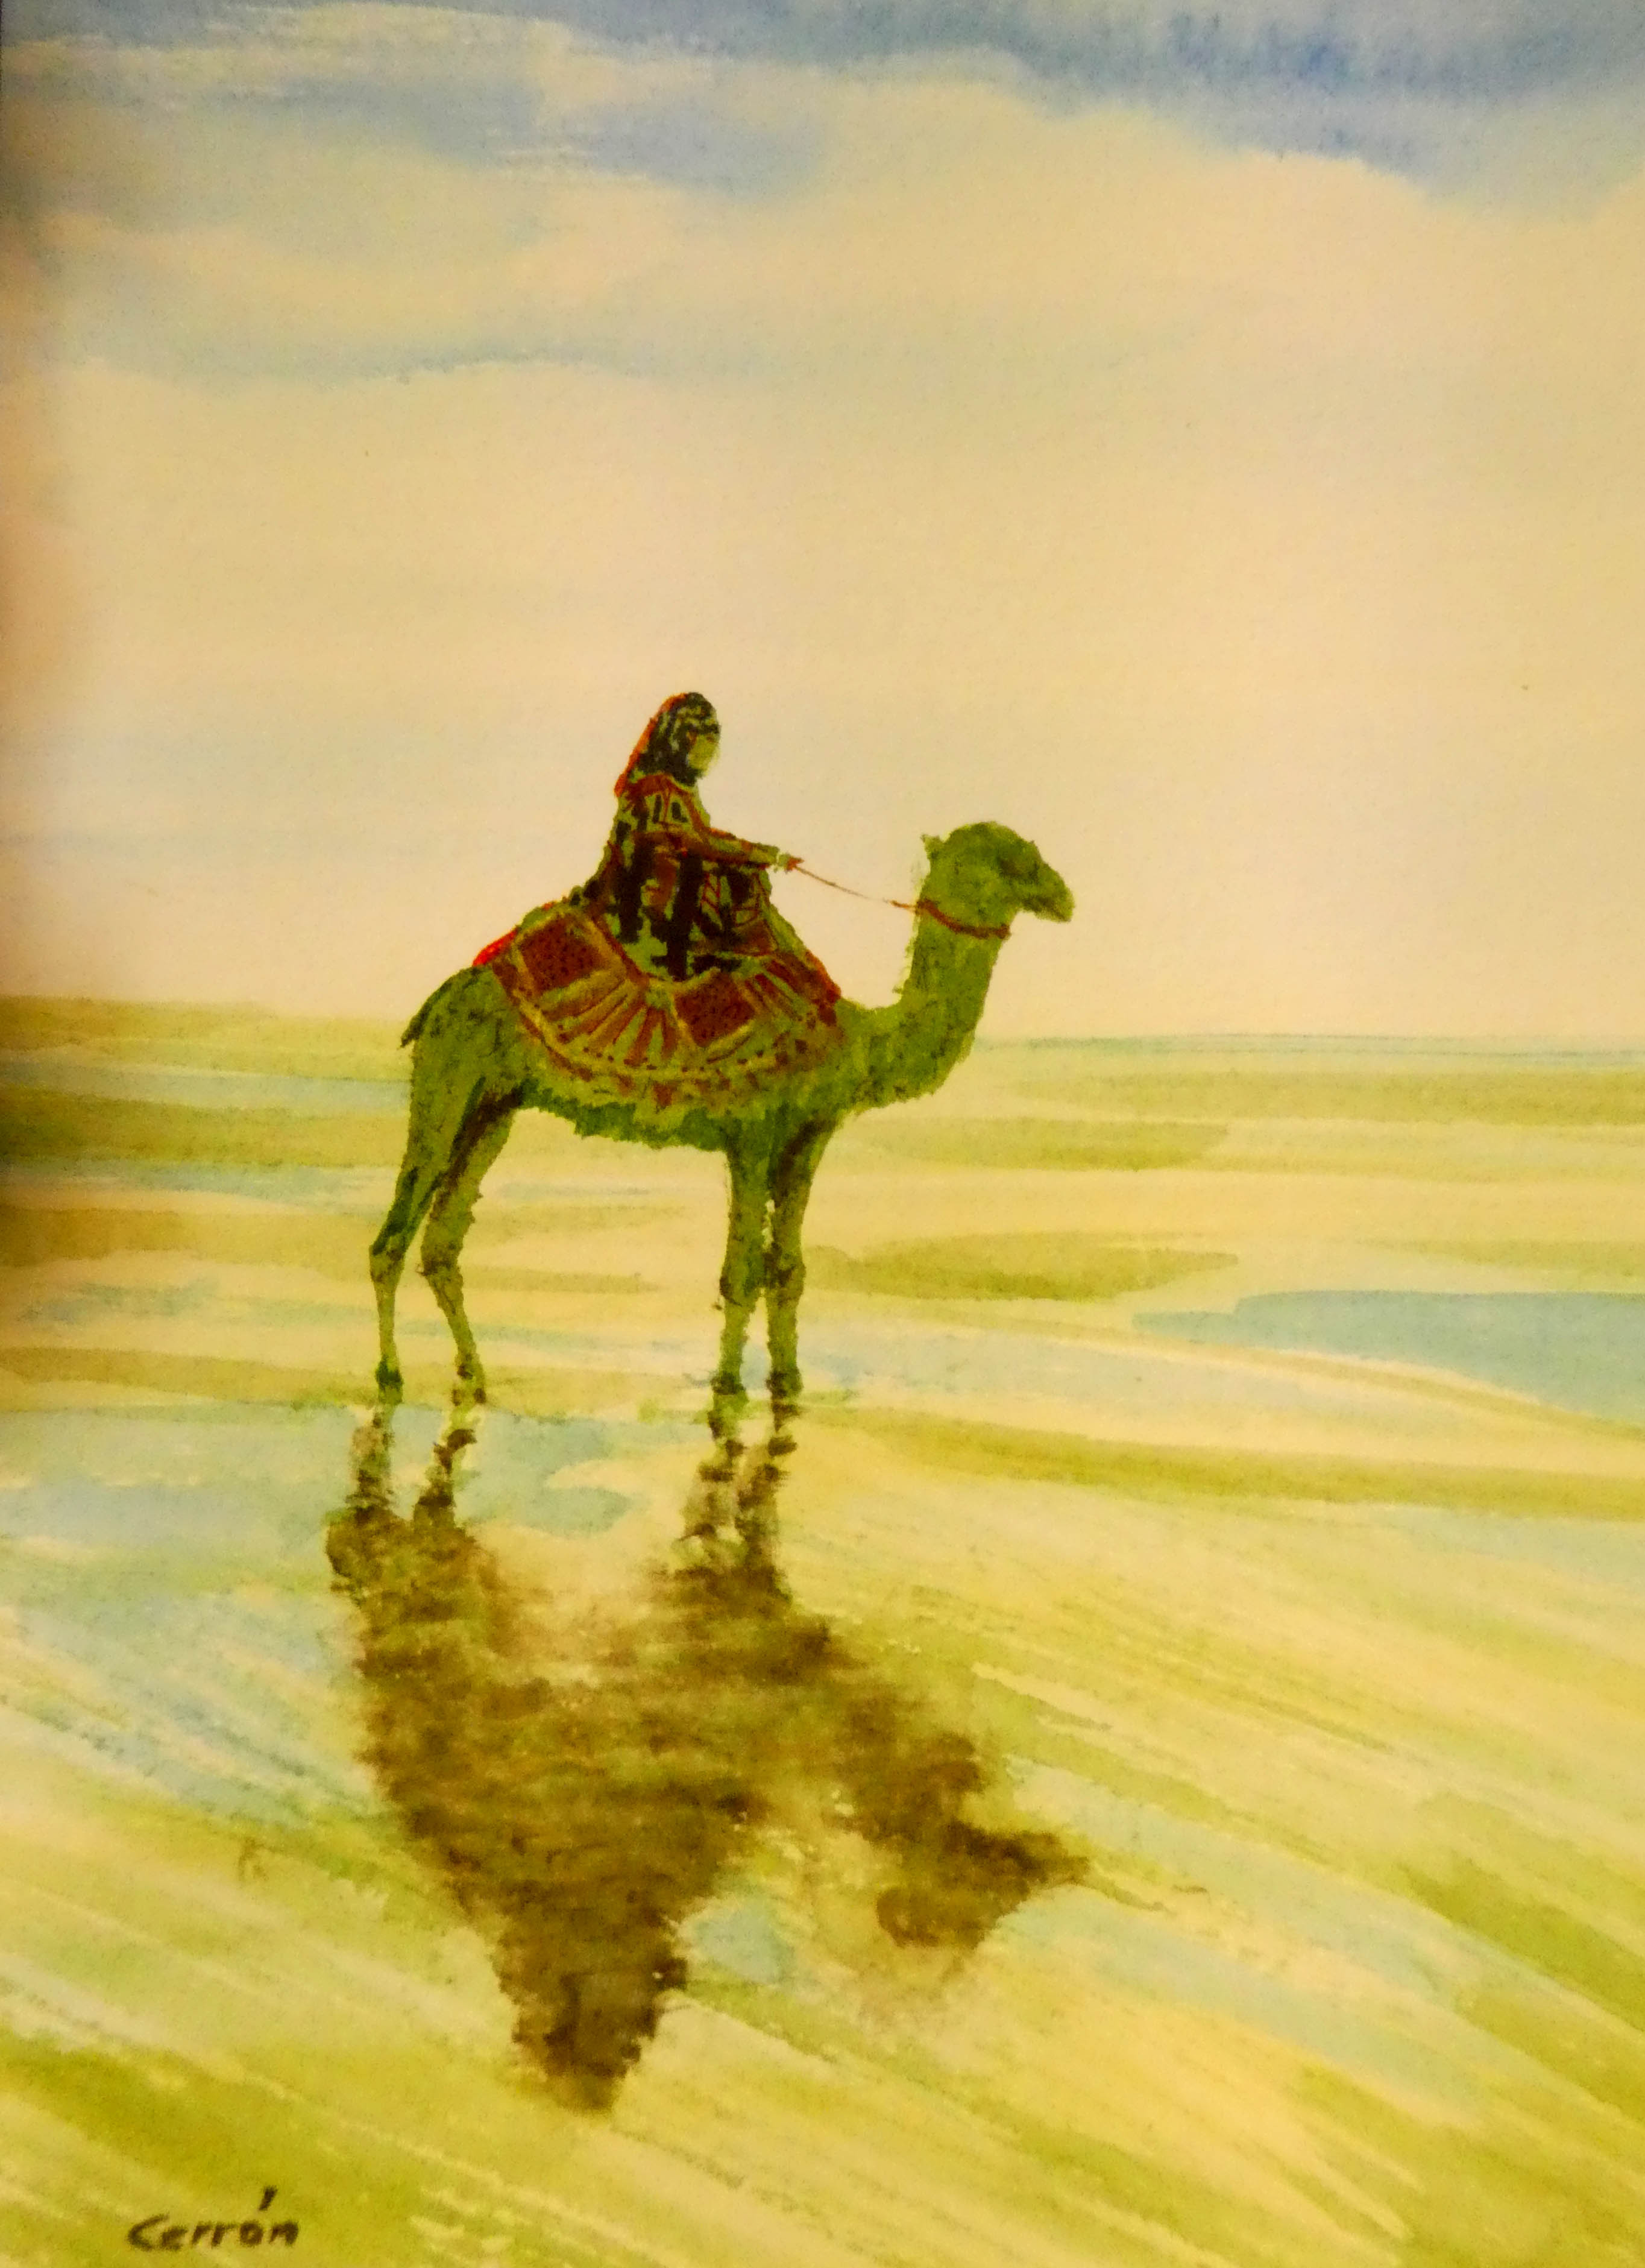 Acuarela Camello